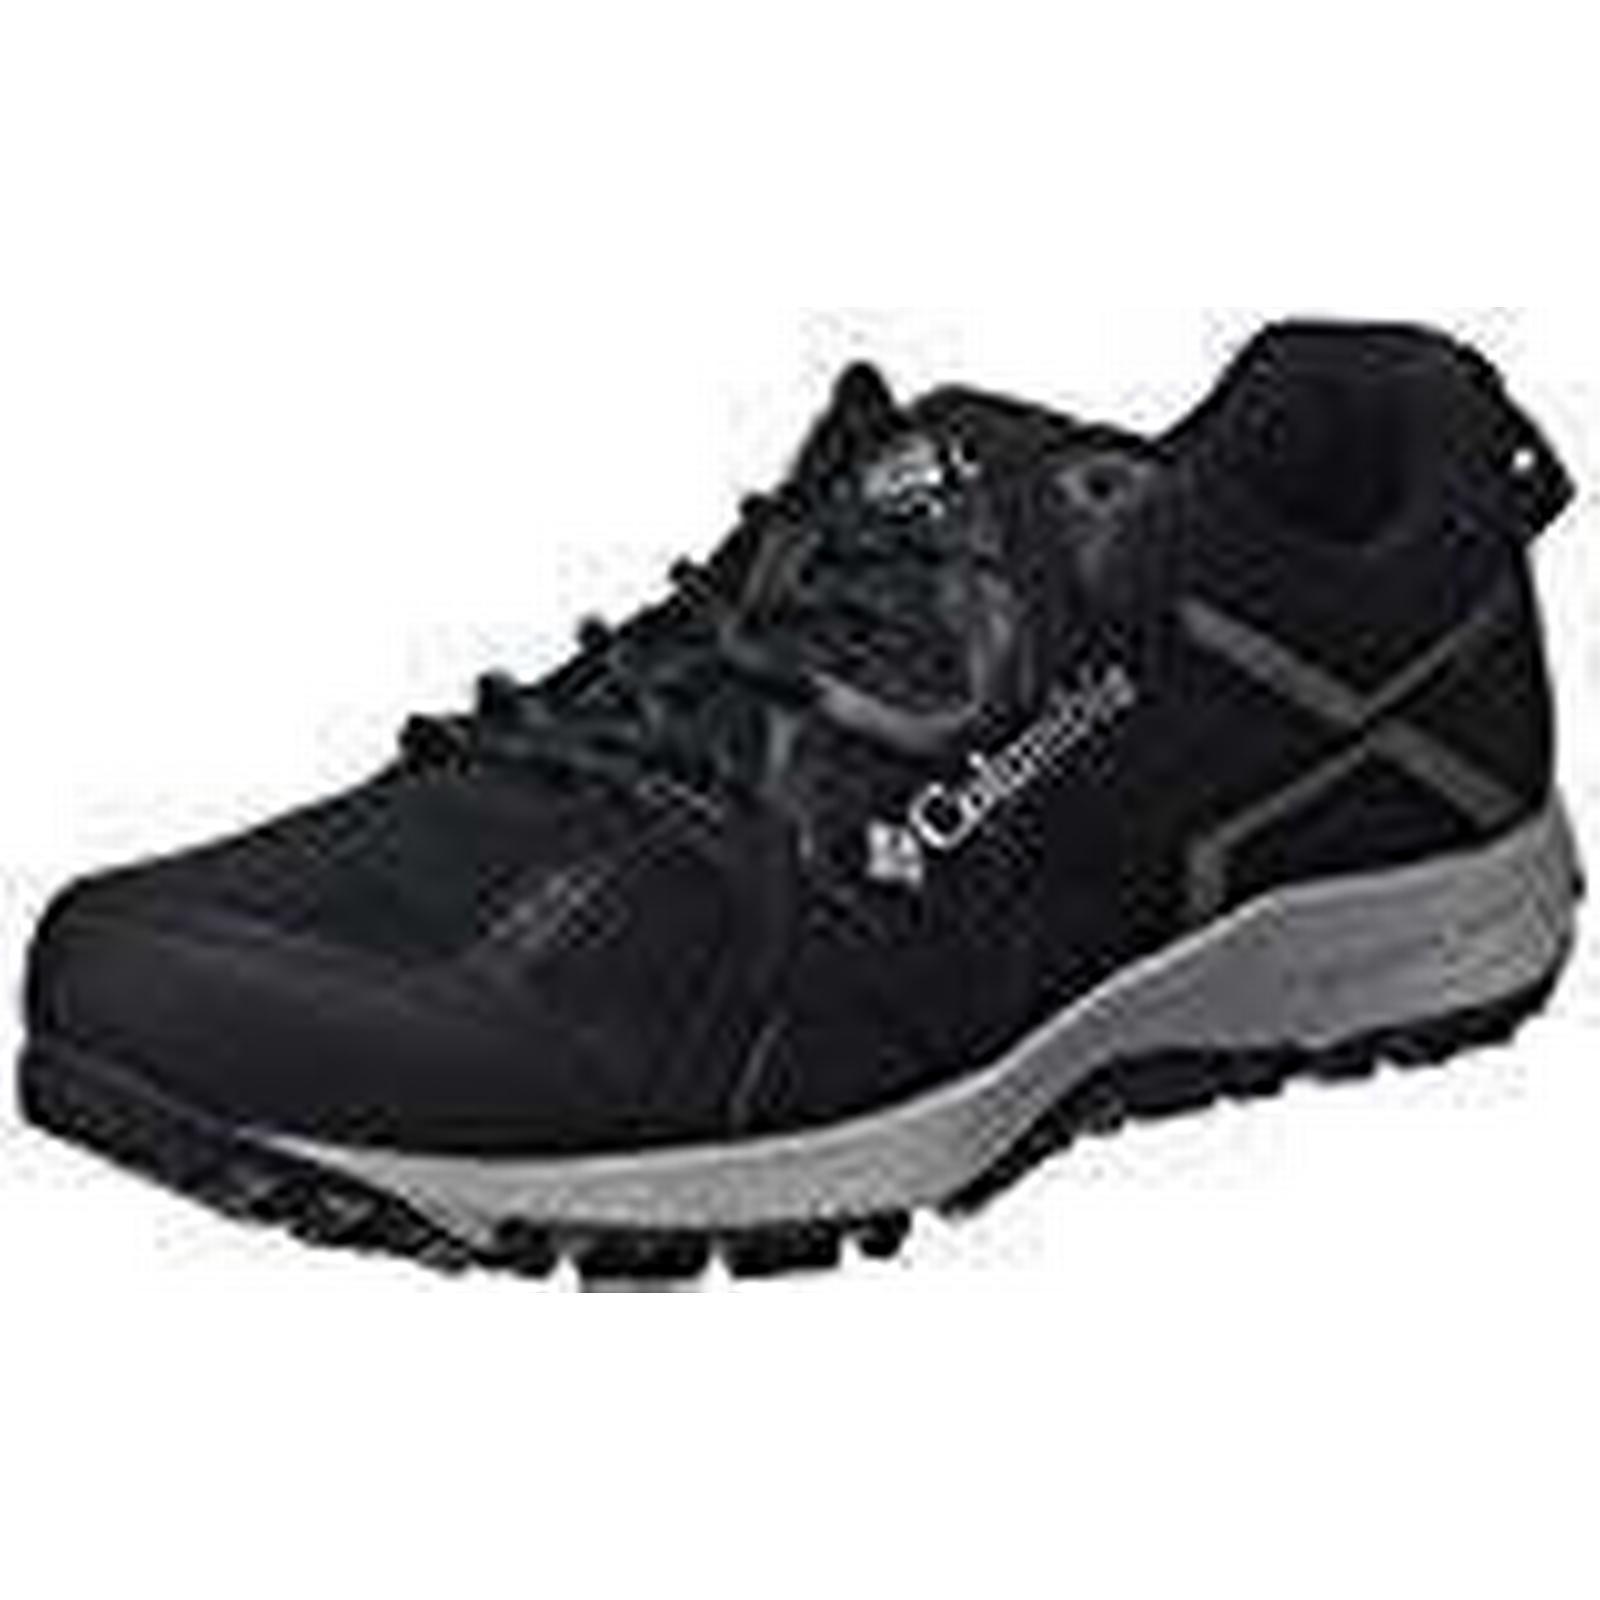 COLUMBIA Men's SWITCHBACK Multisport Shoes, Waterproof, CONSPIRACY SWITCHBACK Men's III OMNI-TECH, Black (Black, Lux), Size: 8.5 3dce96